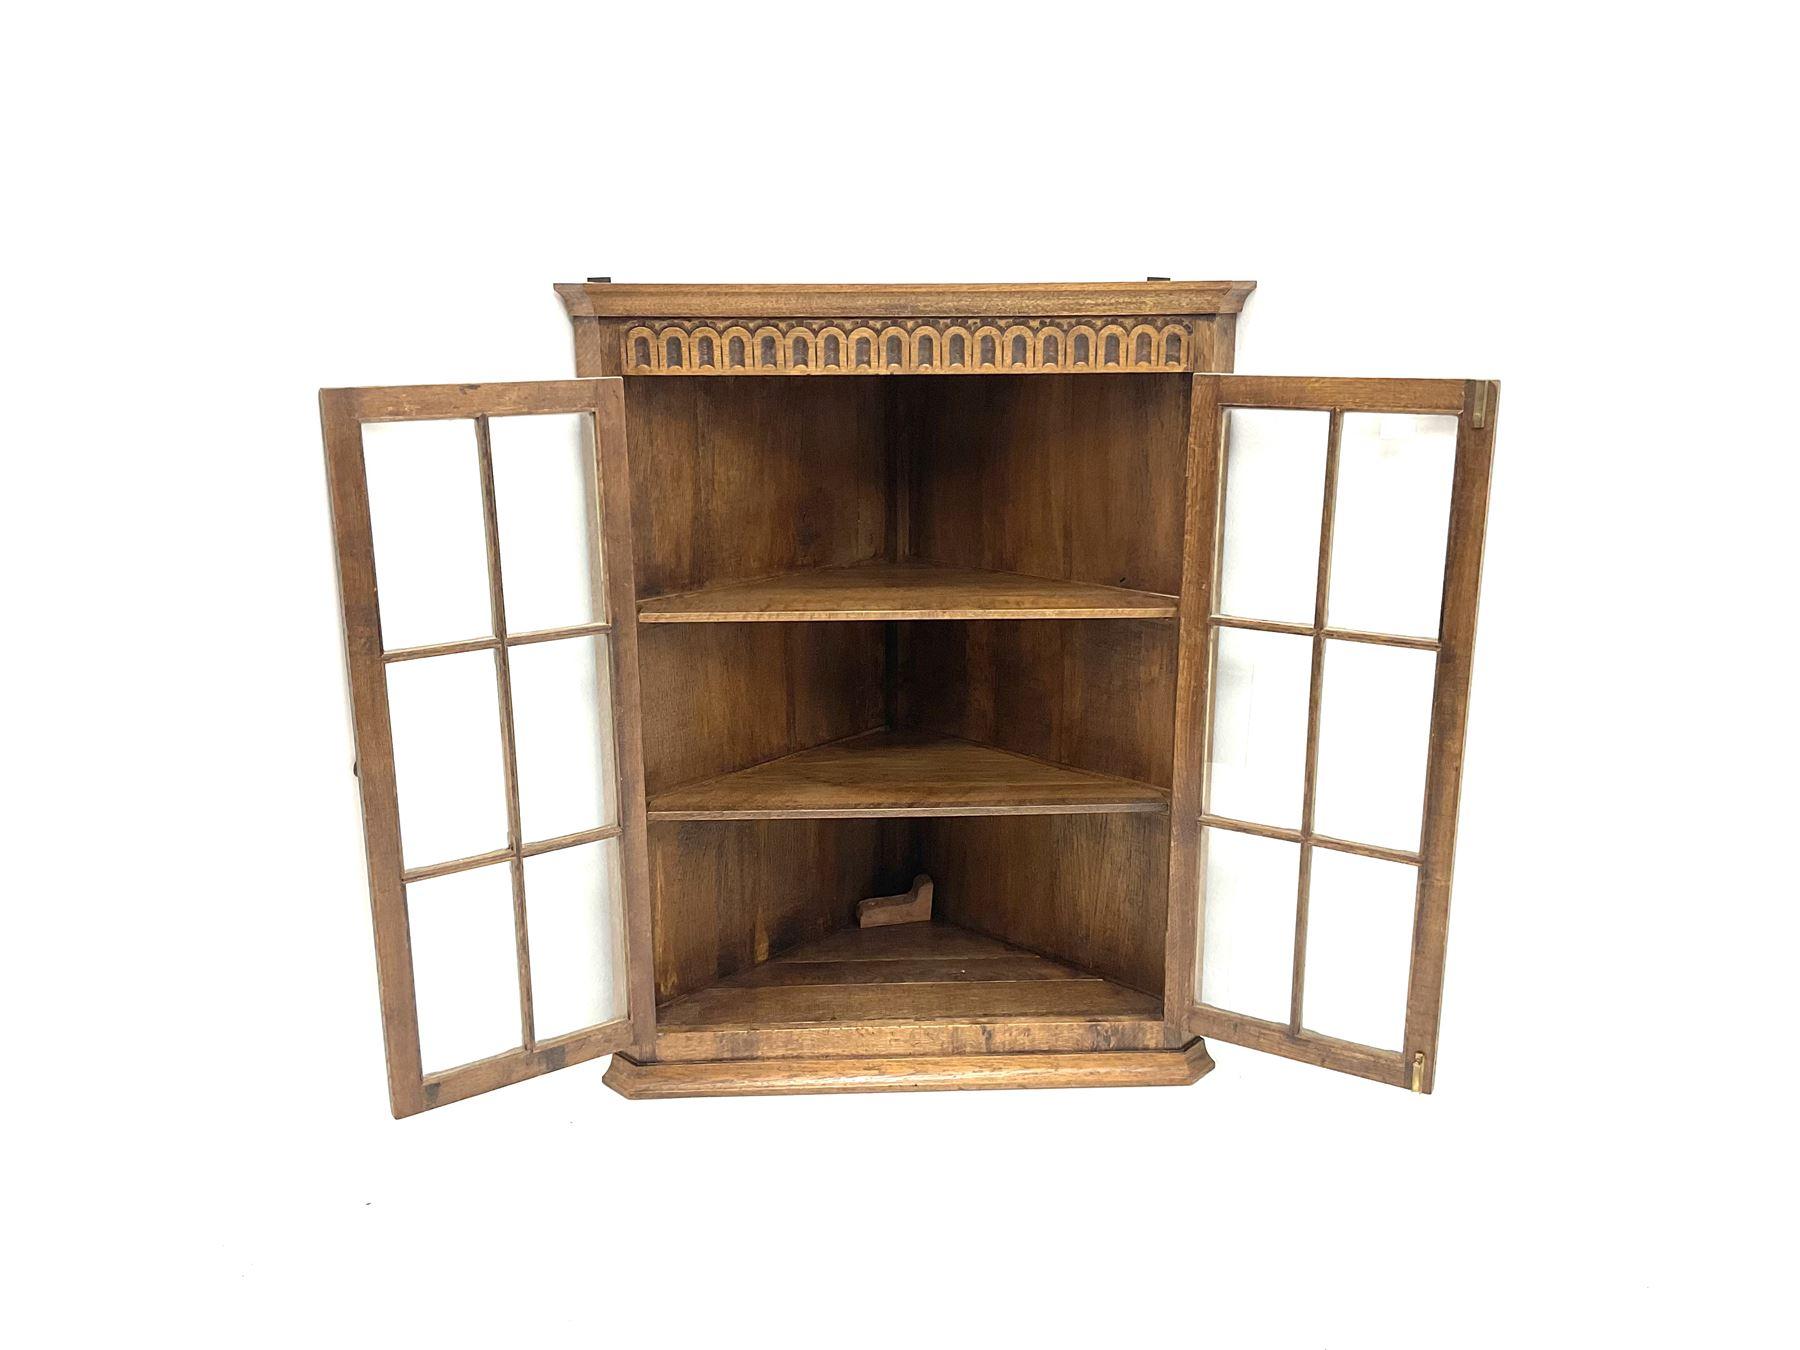 Late 20th century medium oak wall hanging corner cupboard - Image 2 of 2